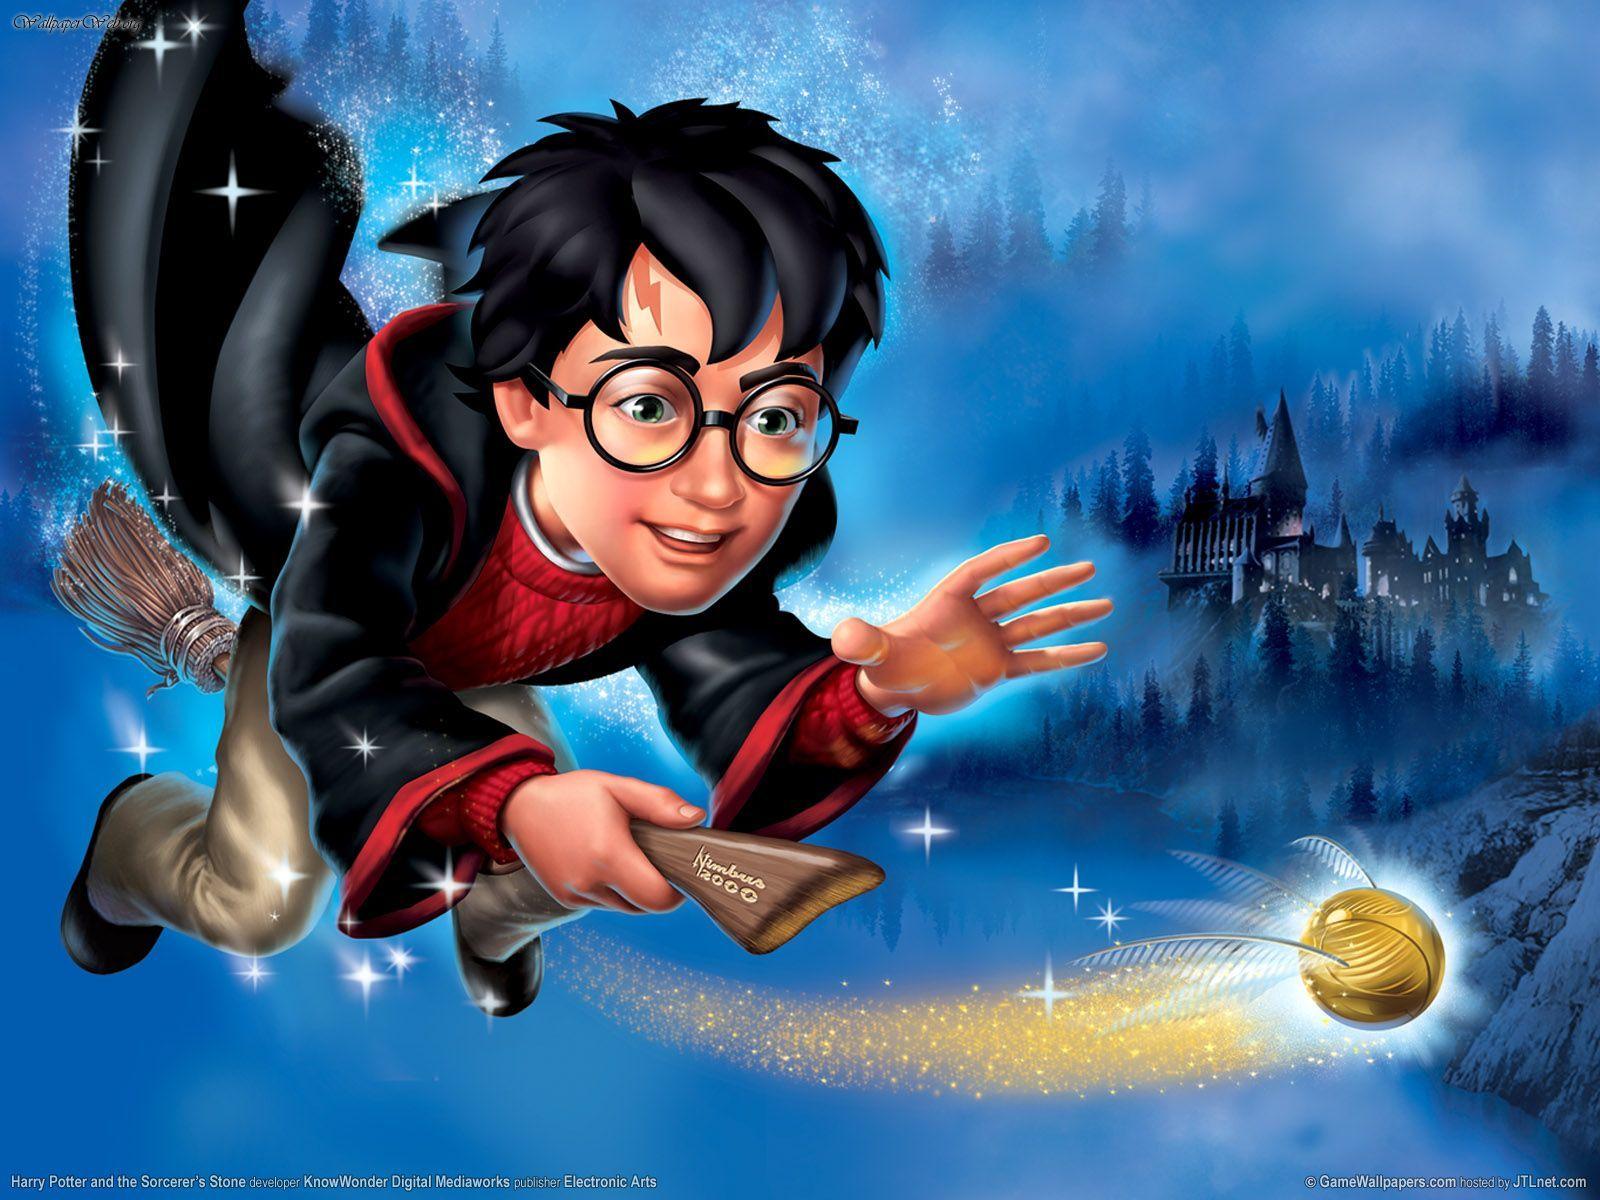 Harry Potter É A Pedra Filosofal in harry potter e a pedra filosofal « fanzone potterish :: harry